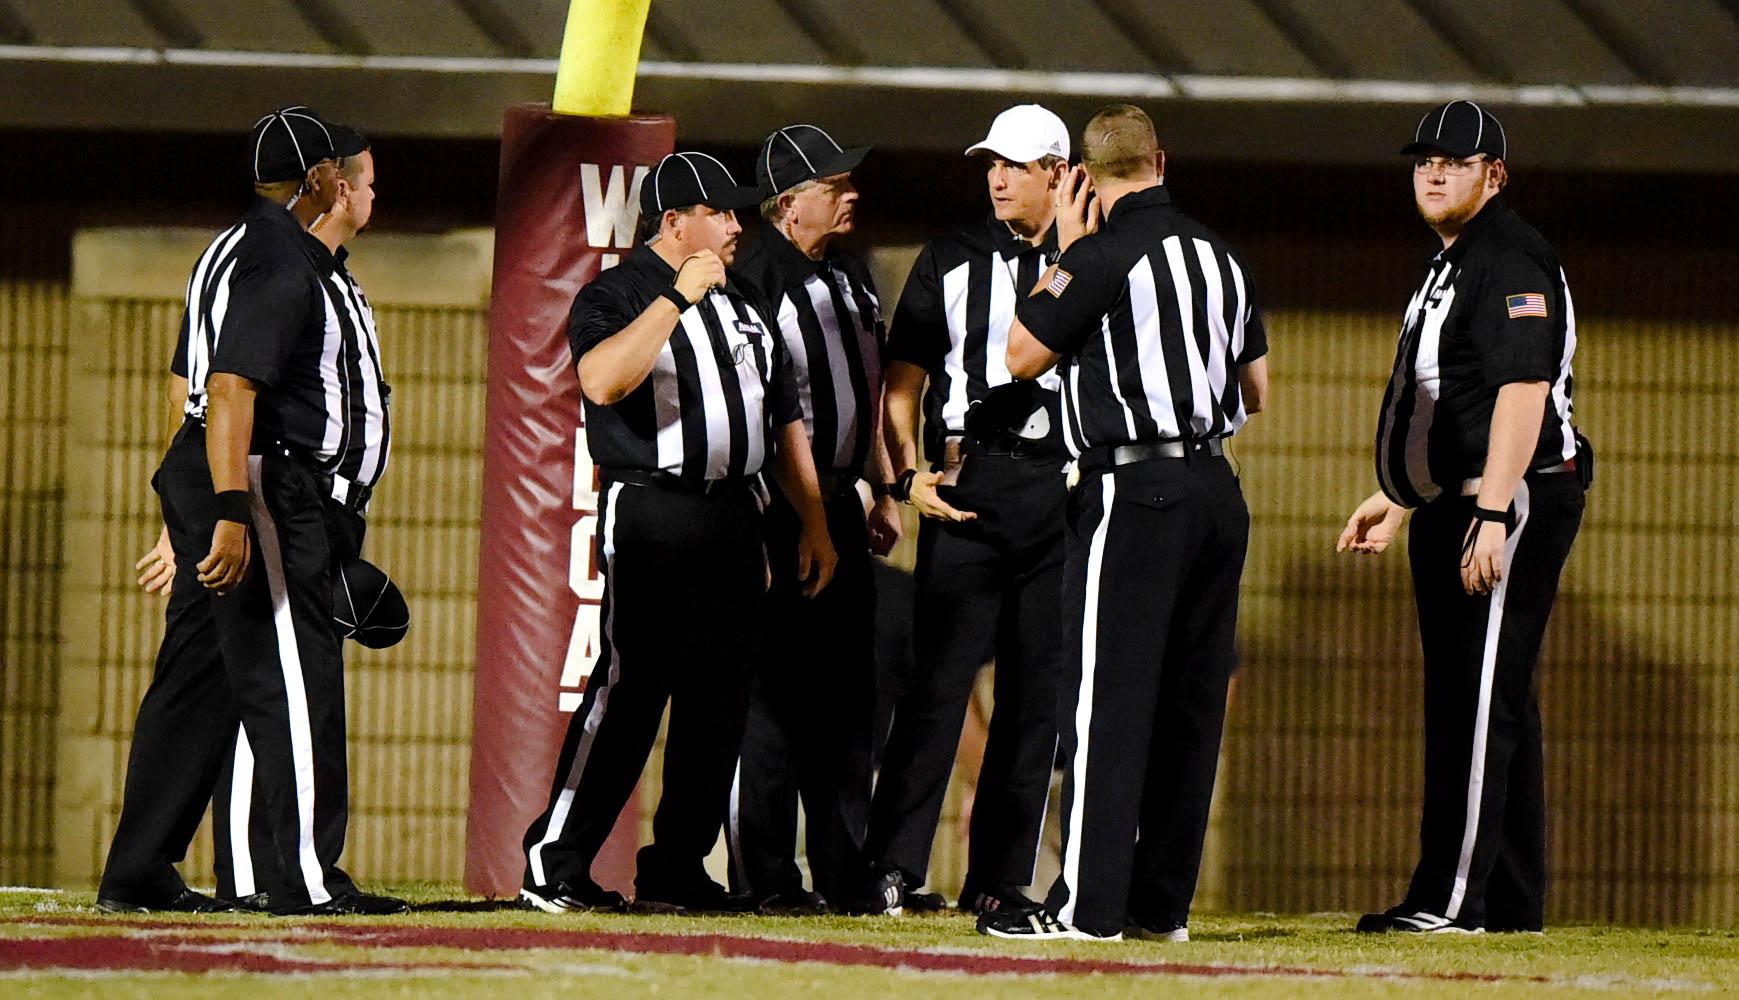 The Longest Current High School Football Winning Streak In Every State